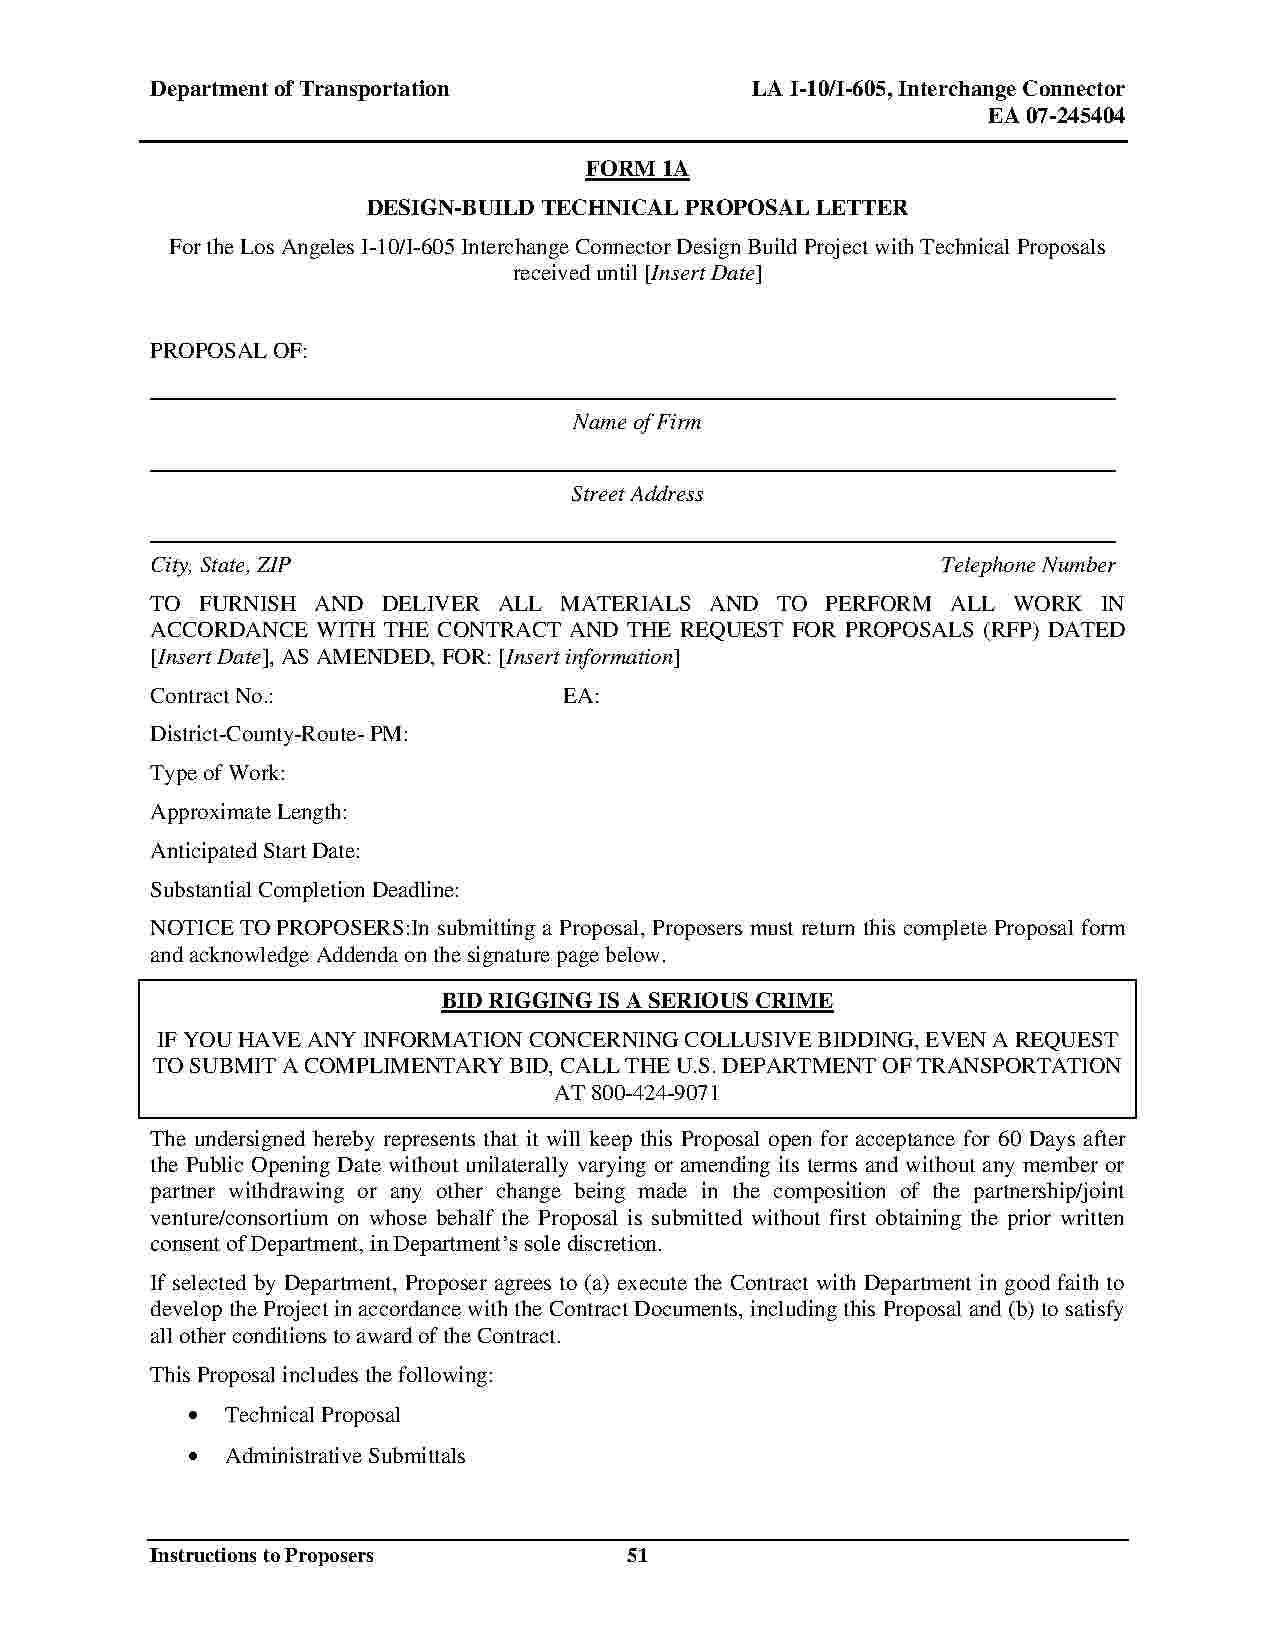 Joint Venture Agreement Joint venture, Proposal letter